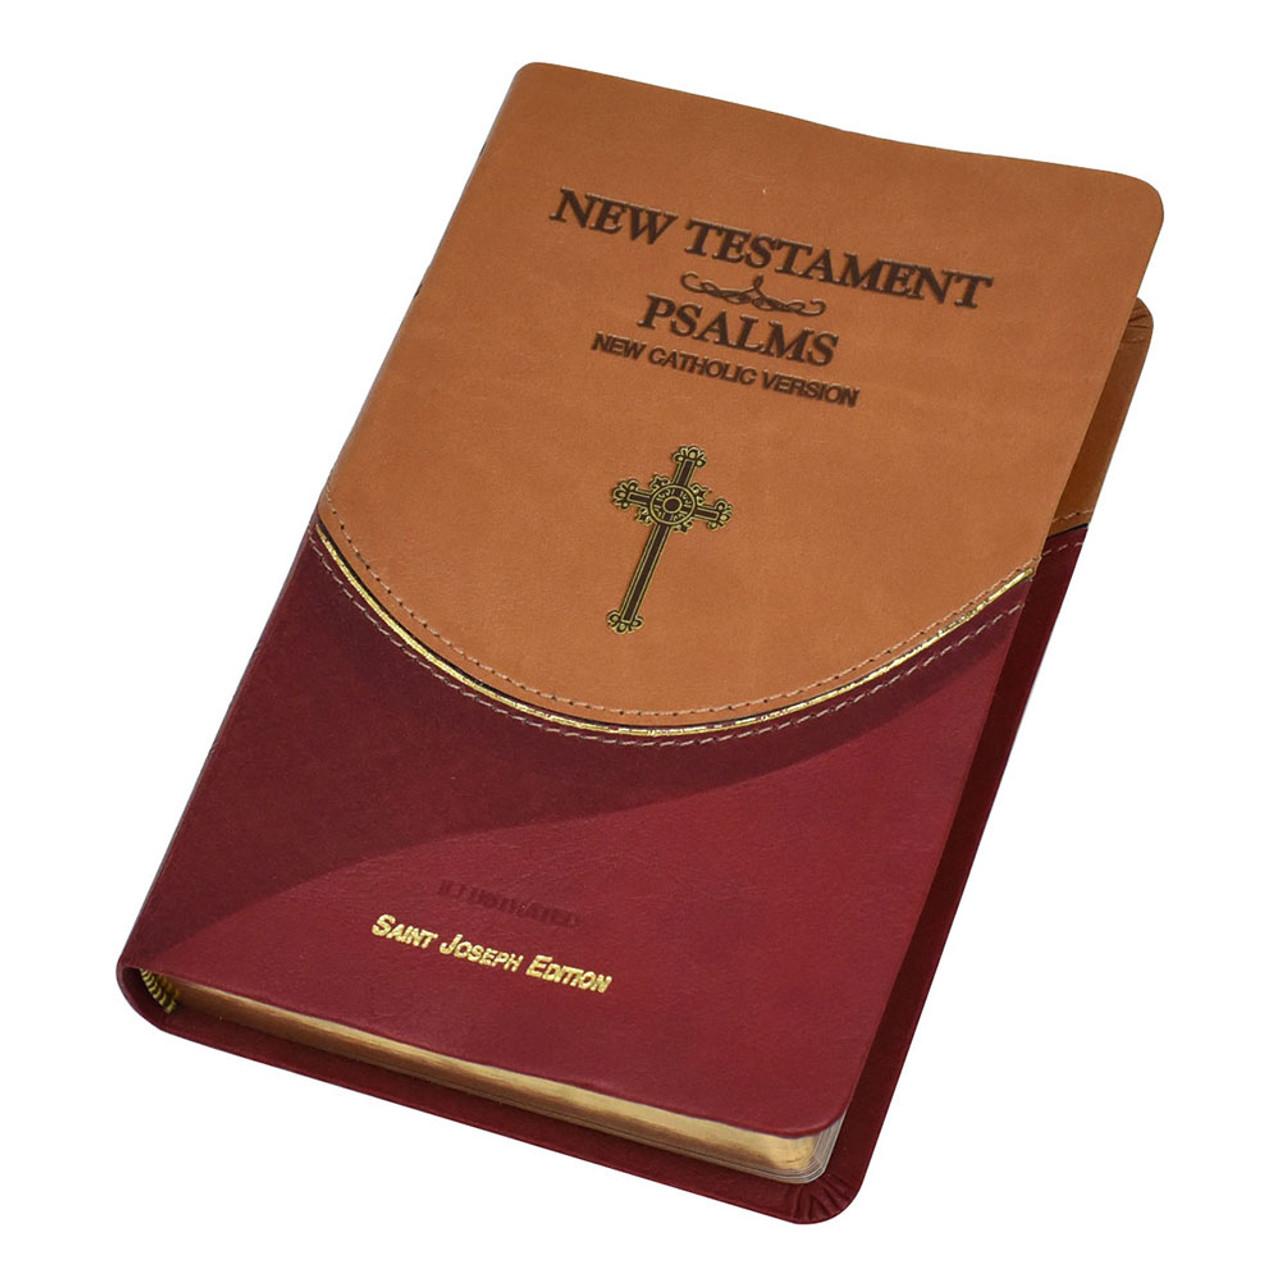 St. Joseph NCV New Testament and Psalms